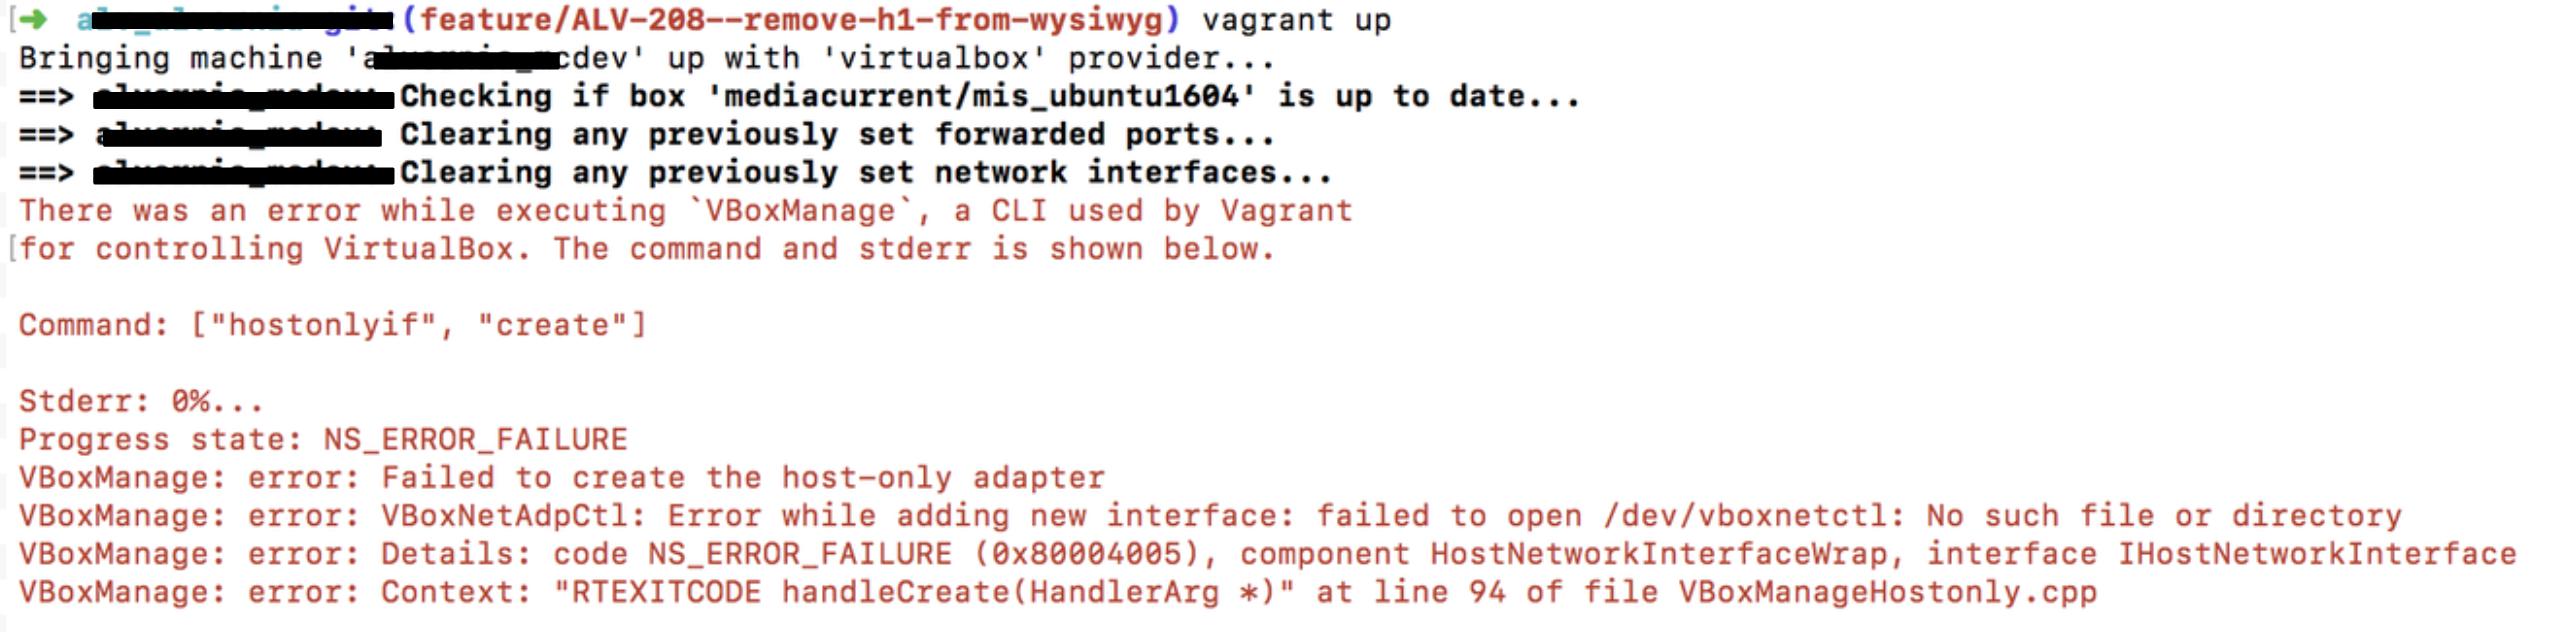 VBox error manage failure